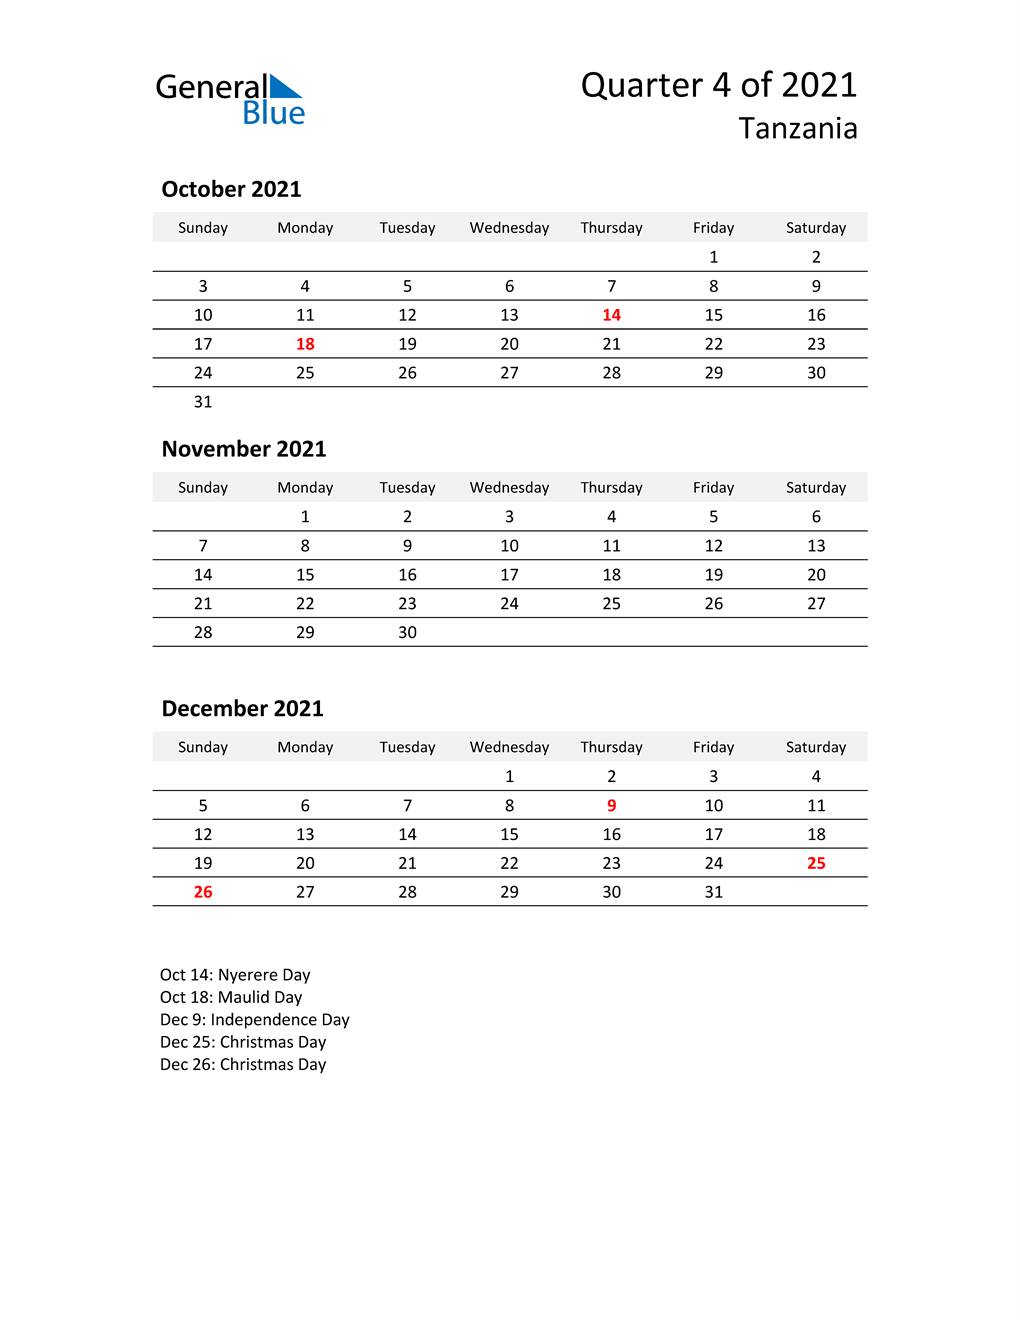 2021 Three-Month Calendar for Tanzania